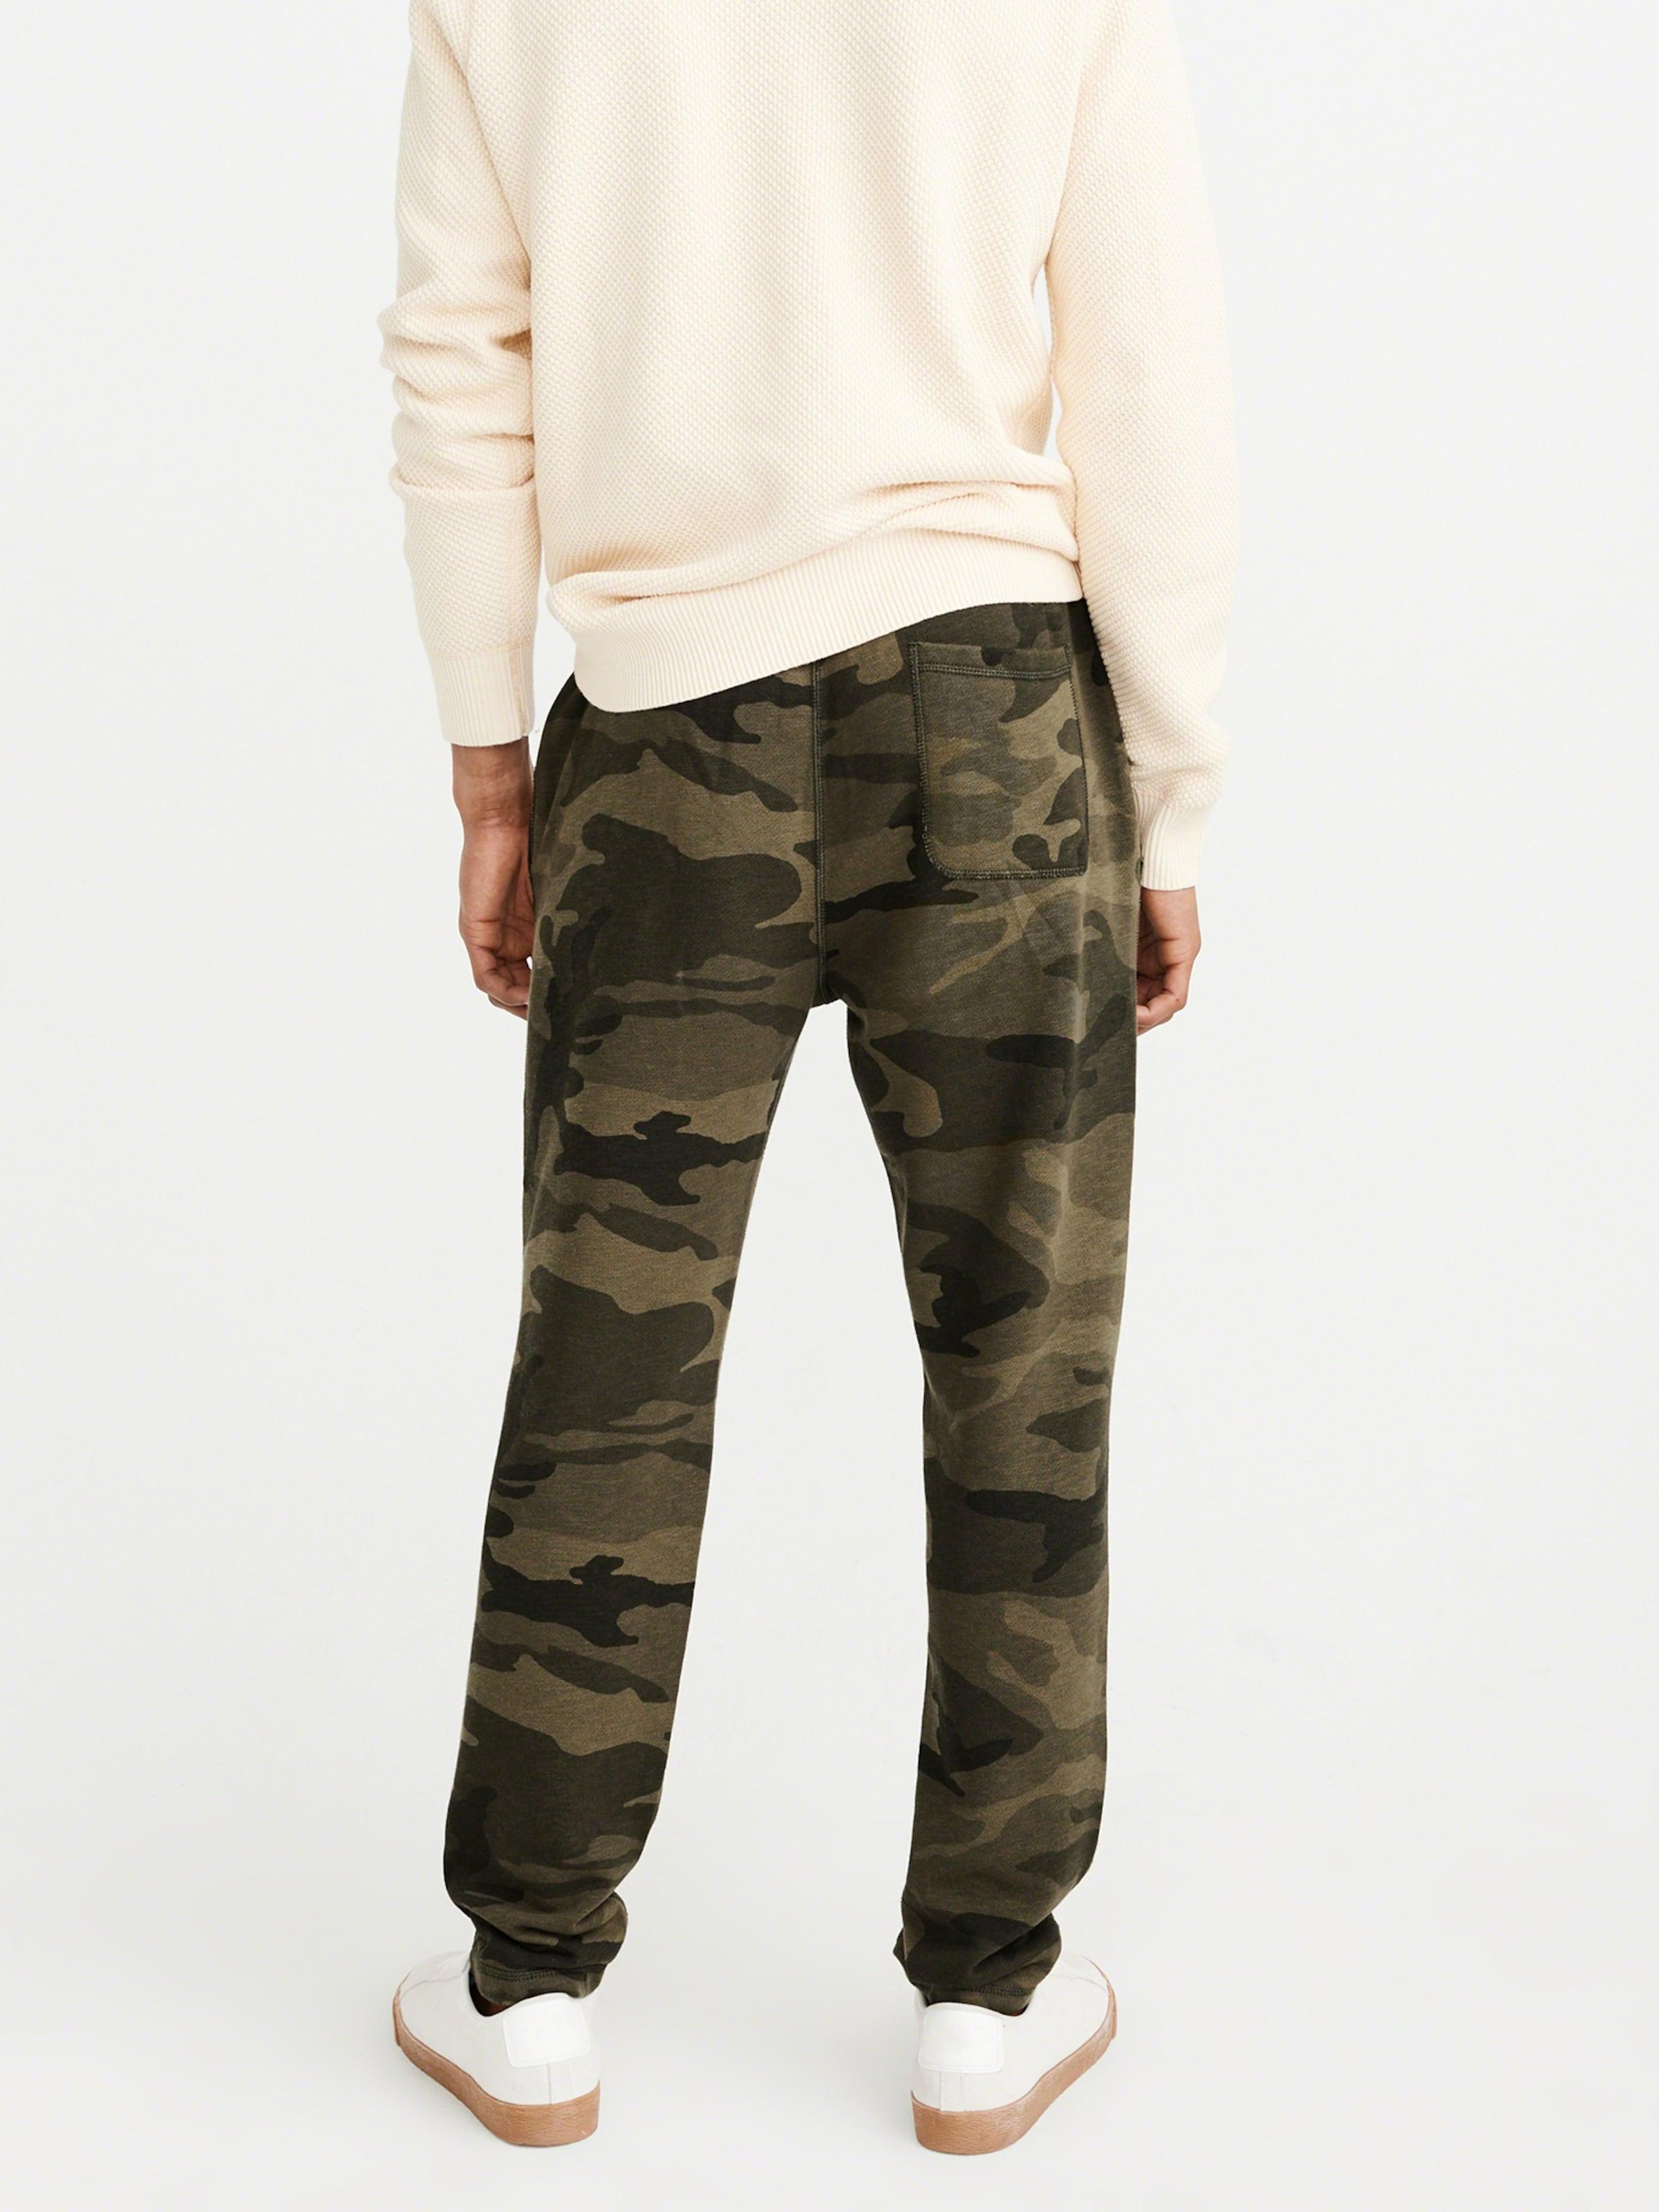 Olive Logo Pant Camo' Abercrombieamp; Fitch Classic Pantalon En 'forever vm8wN0n